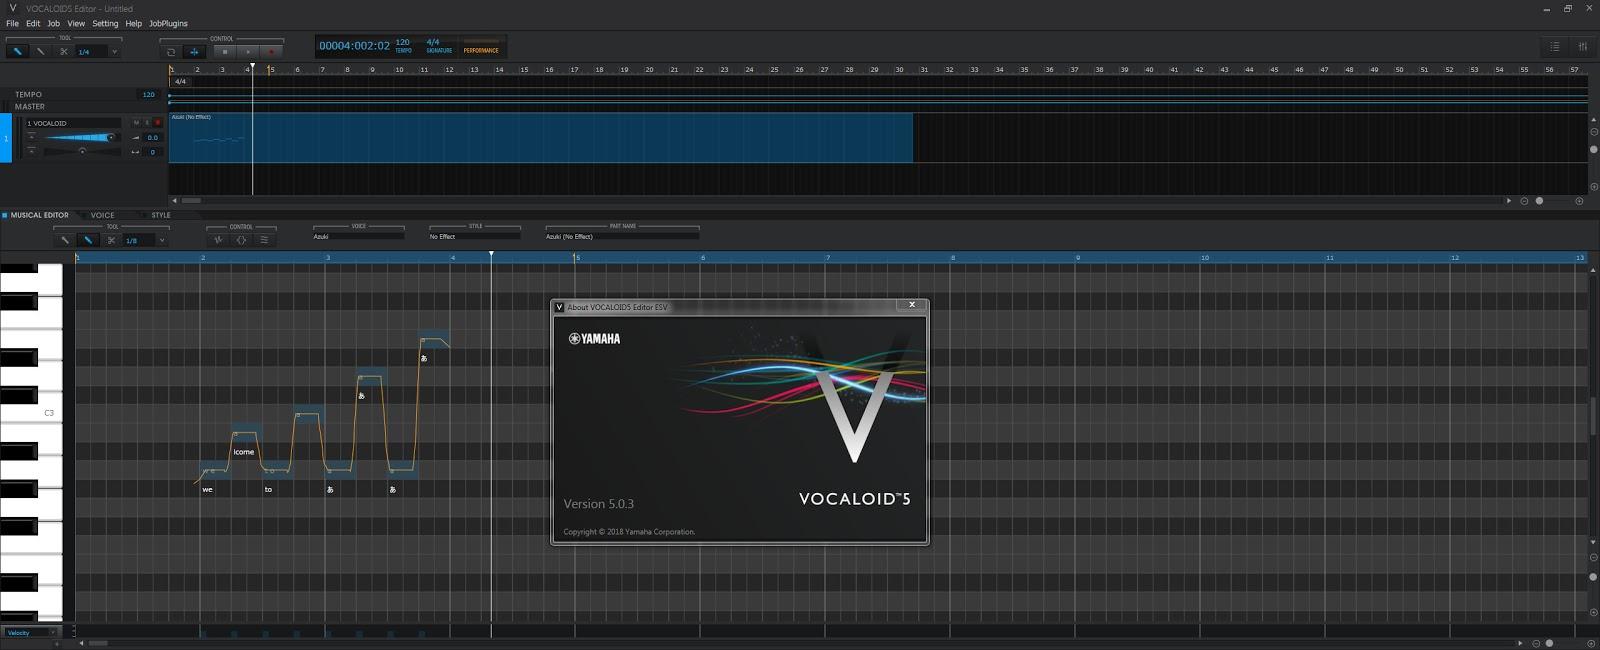 YAMAHA Vocaloid 5 ESV v5.0.3.1 Full version